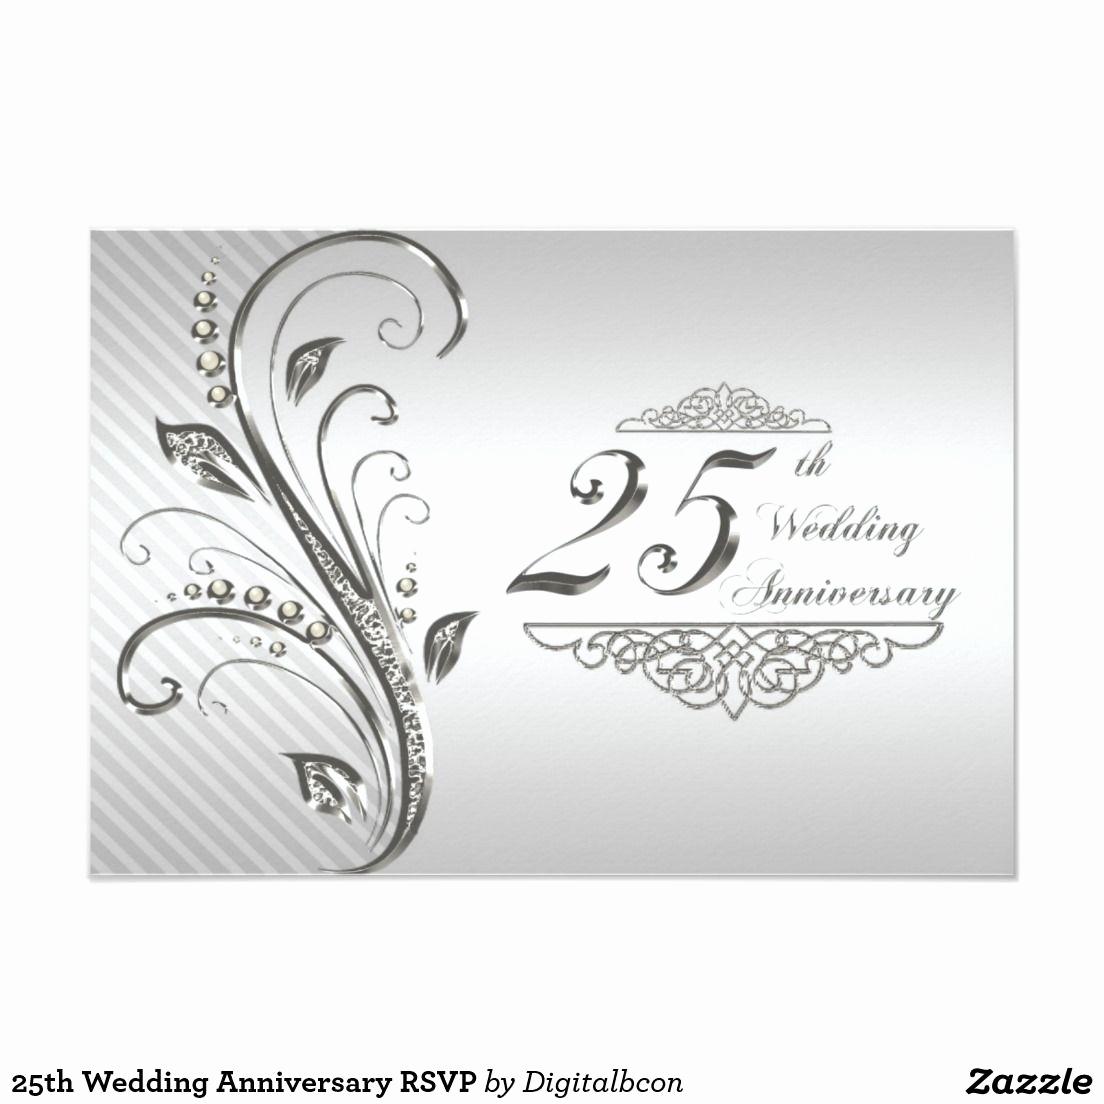 25th Anniversary Invitation Cards Beautiful 25th Wedding Anniversary Rsvp Invitation